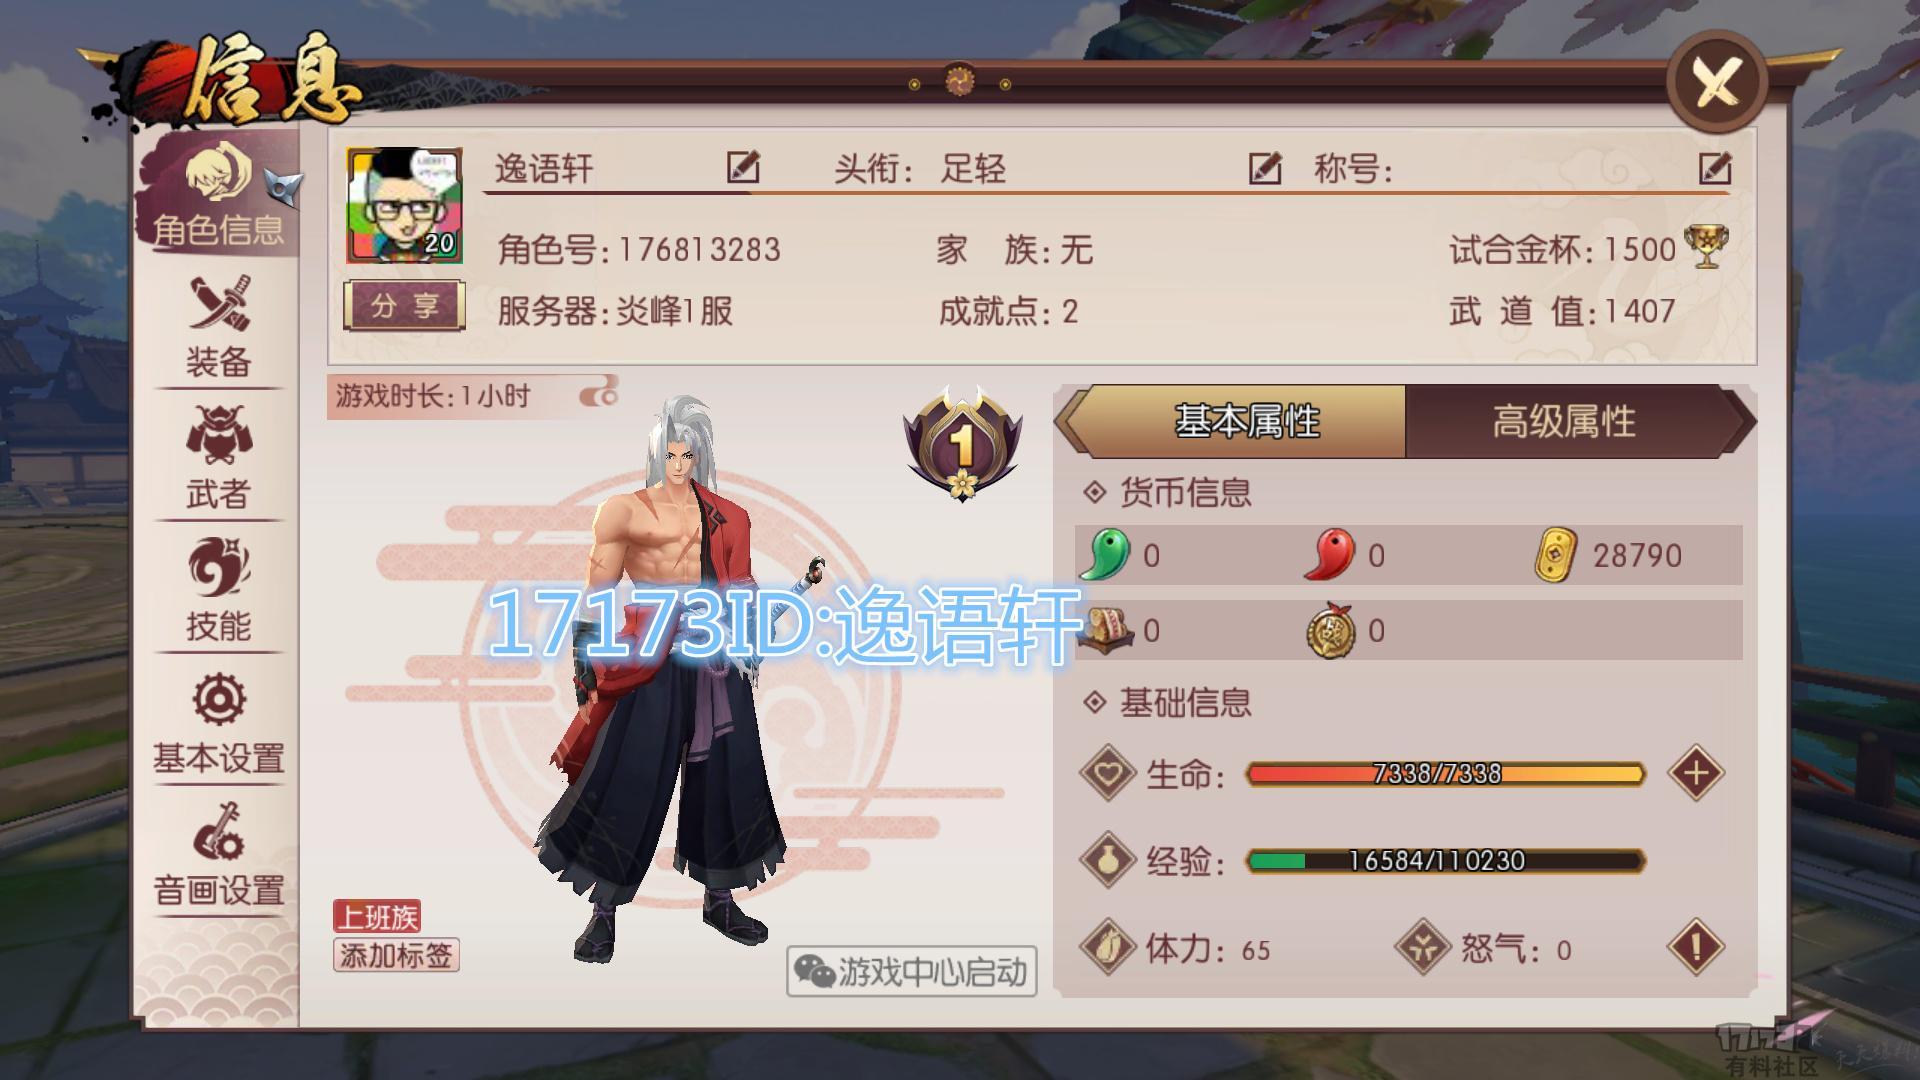 Screenshot_2018-12-03-18-04-43-432_com.tencent.shihun.android_副本.jpg